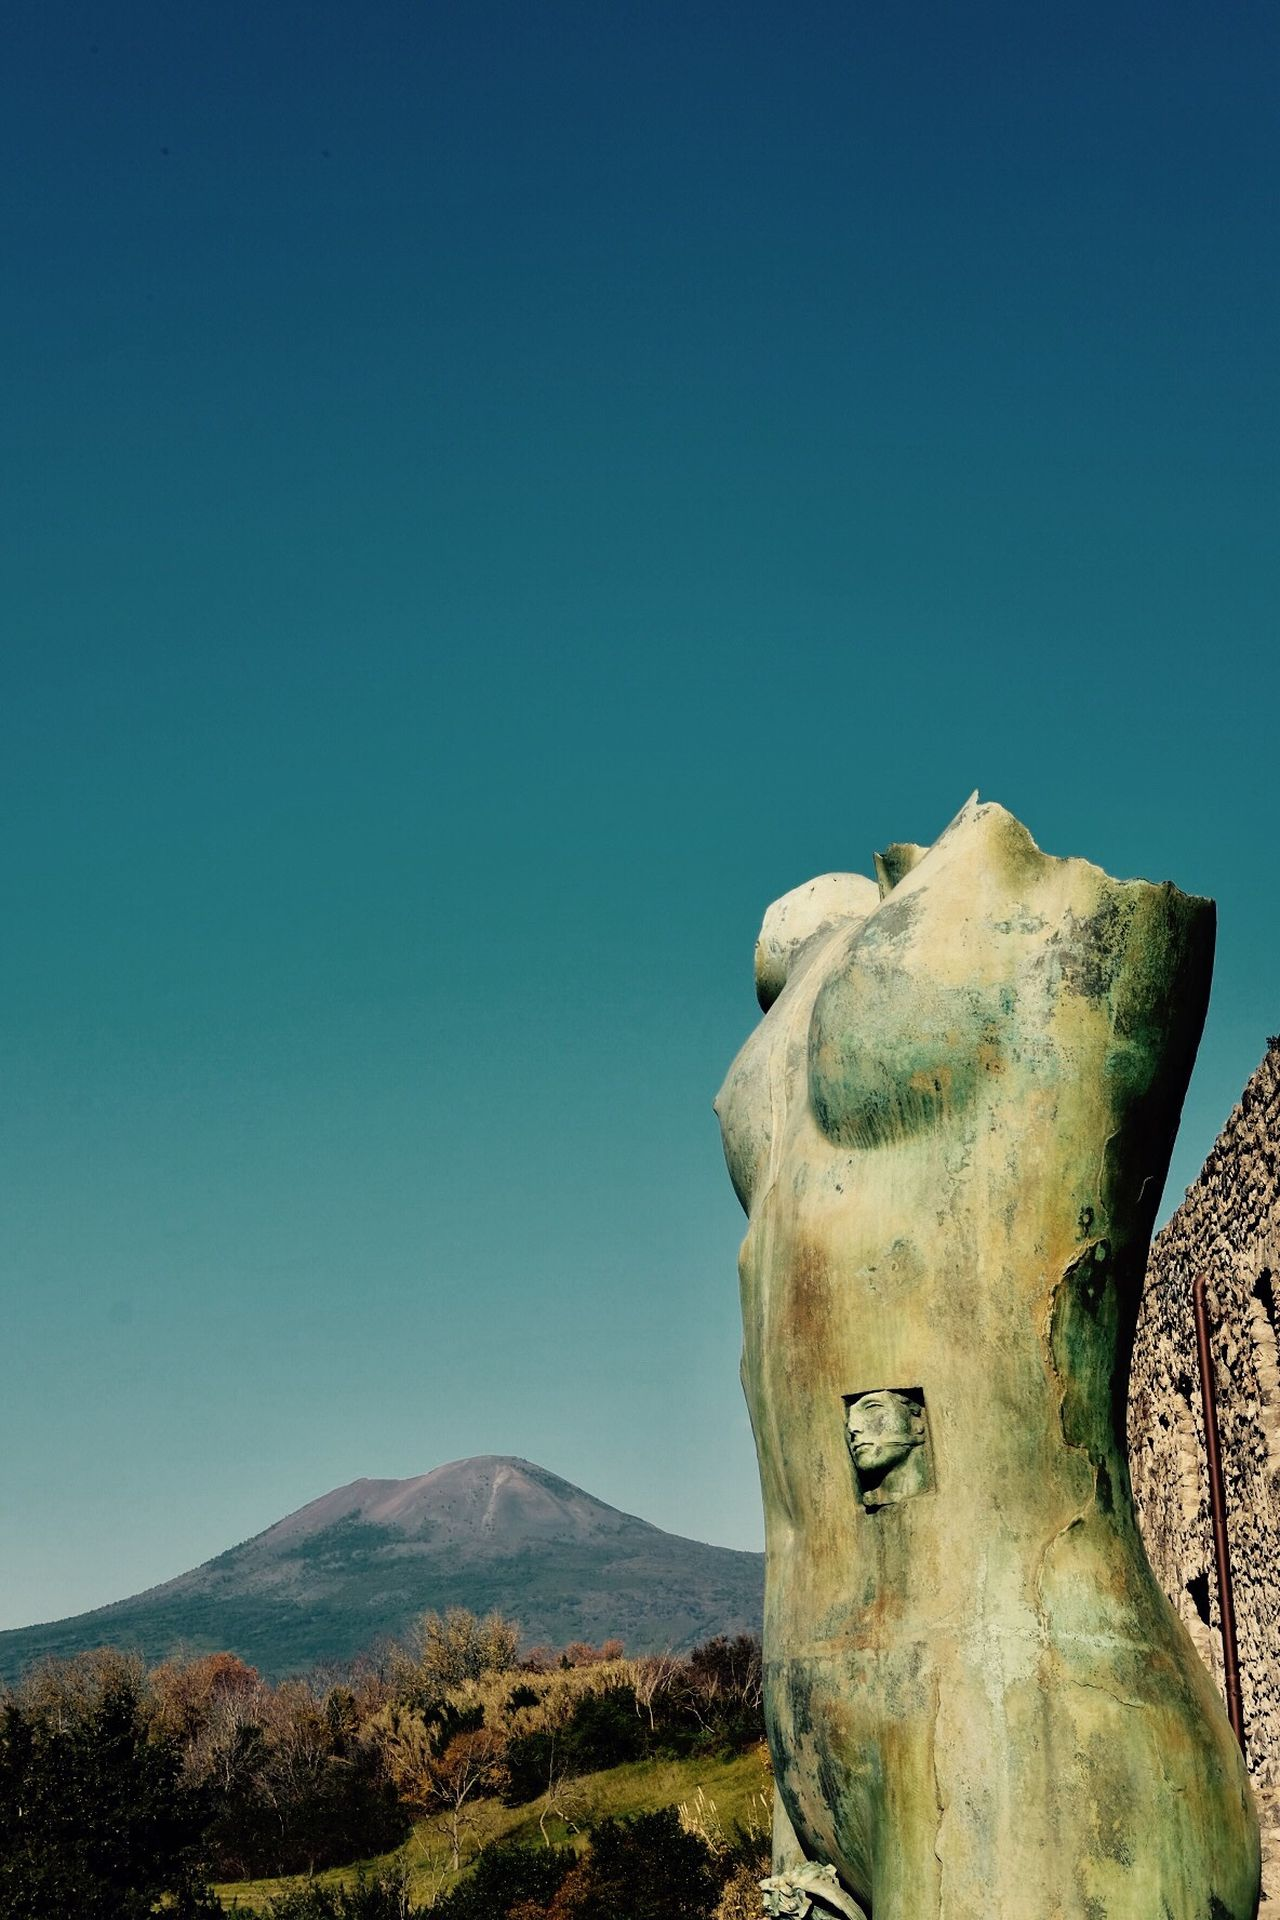 Igor Mitorj at Pompeii nNo PeoplemMountainsScenicssStatuenNatureoOutdoorsdDaysSculpturesSkyTTheMinimals (less Edit Juxt Photography)NNotes From BabylonWWalking AroundFFine Art PhotographyTTaking PhotossShootermag tTravel Destinations